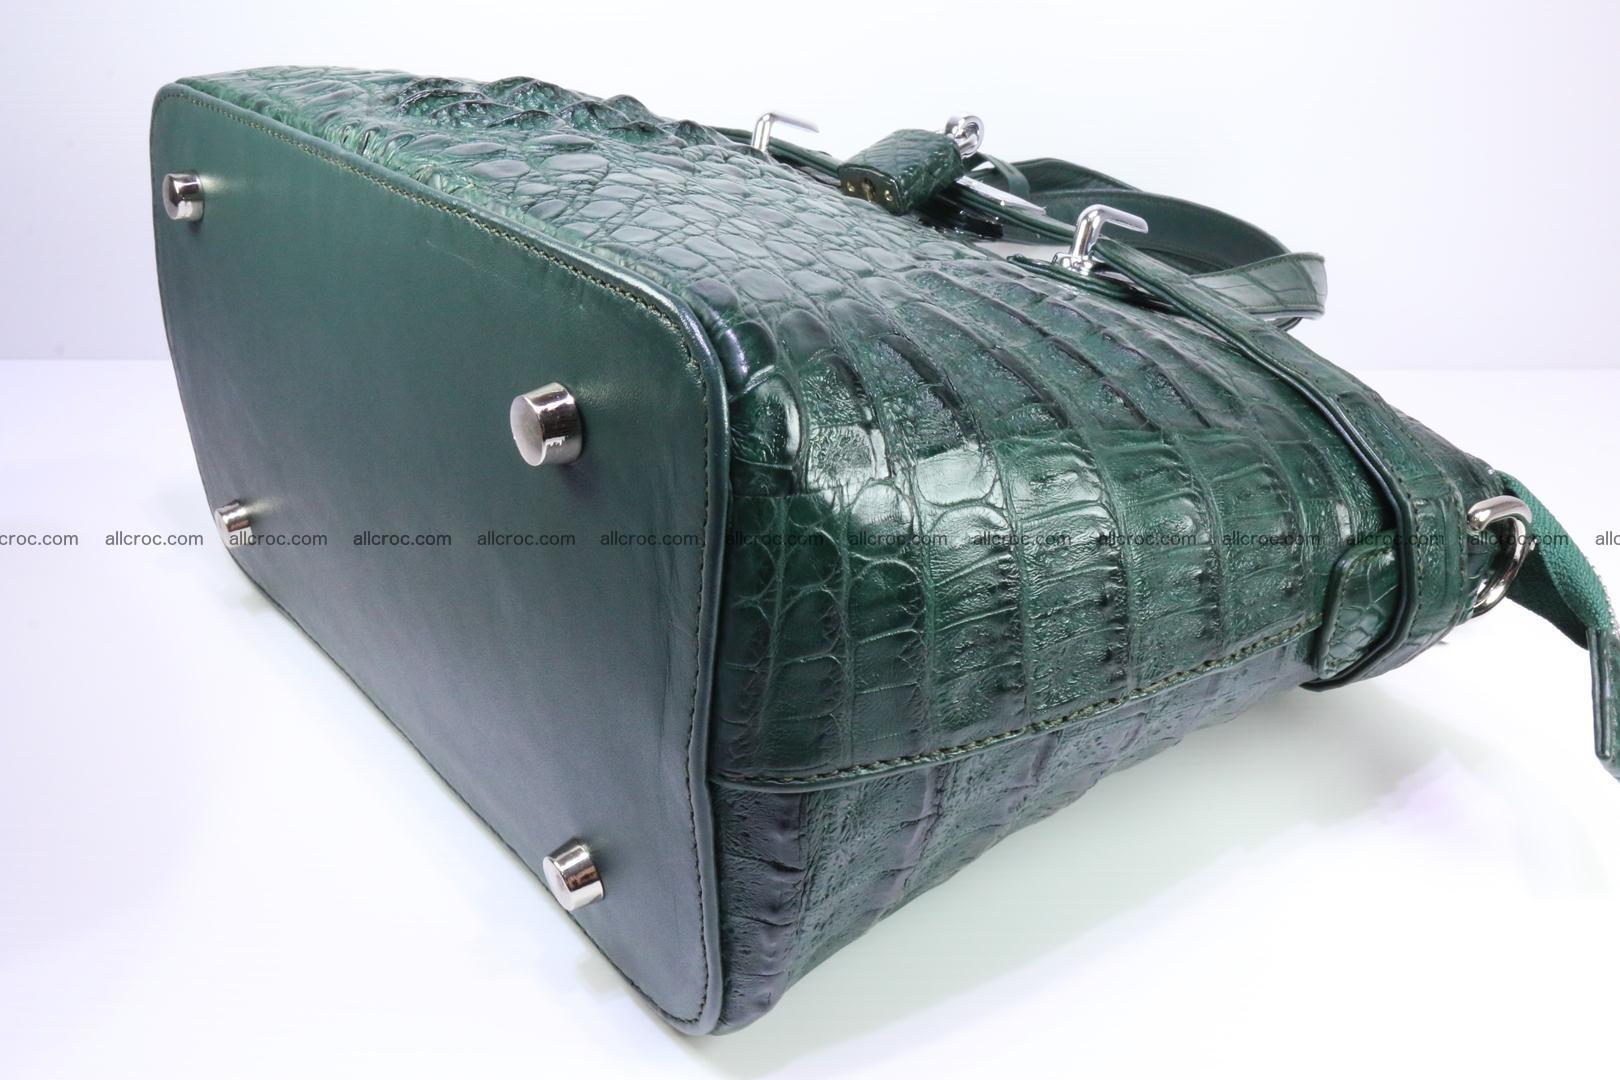 Genuine crocodile handbag for ladies 047 Foto 12